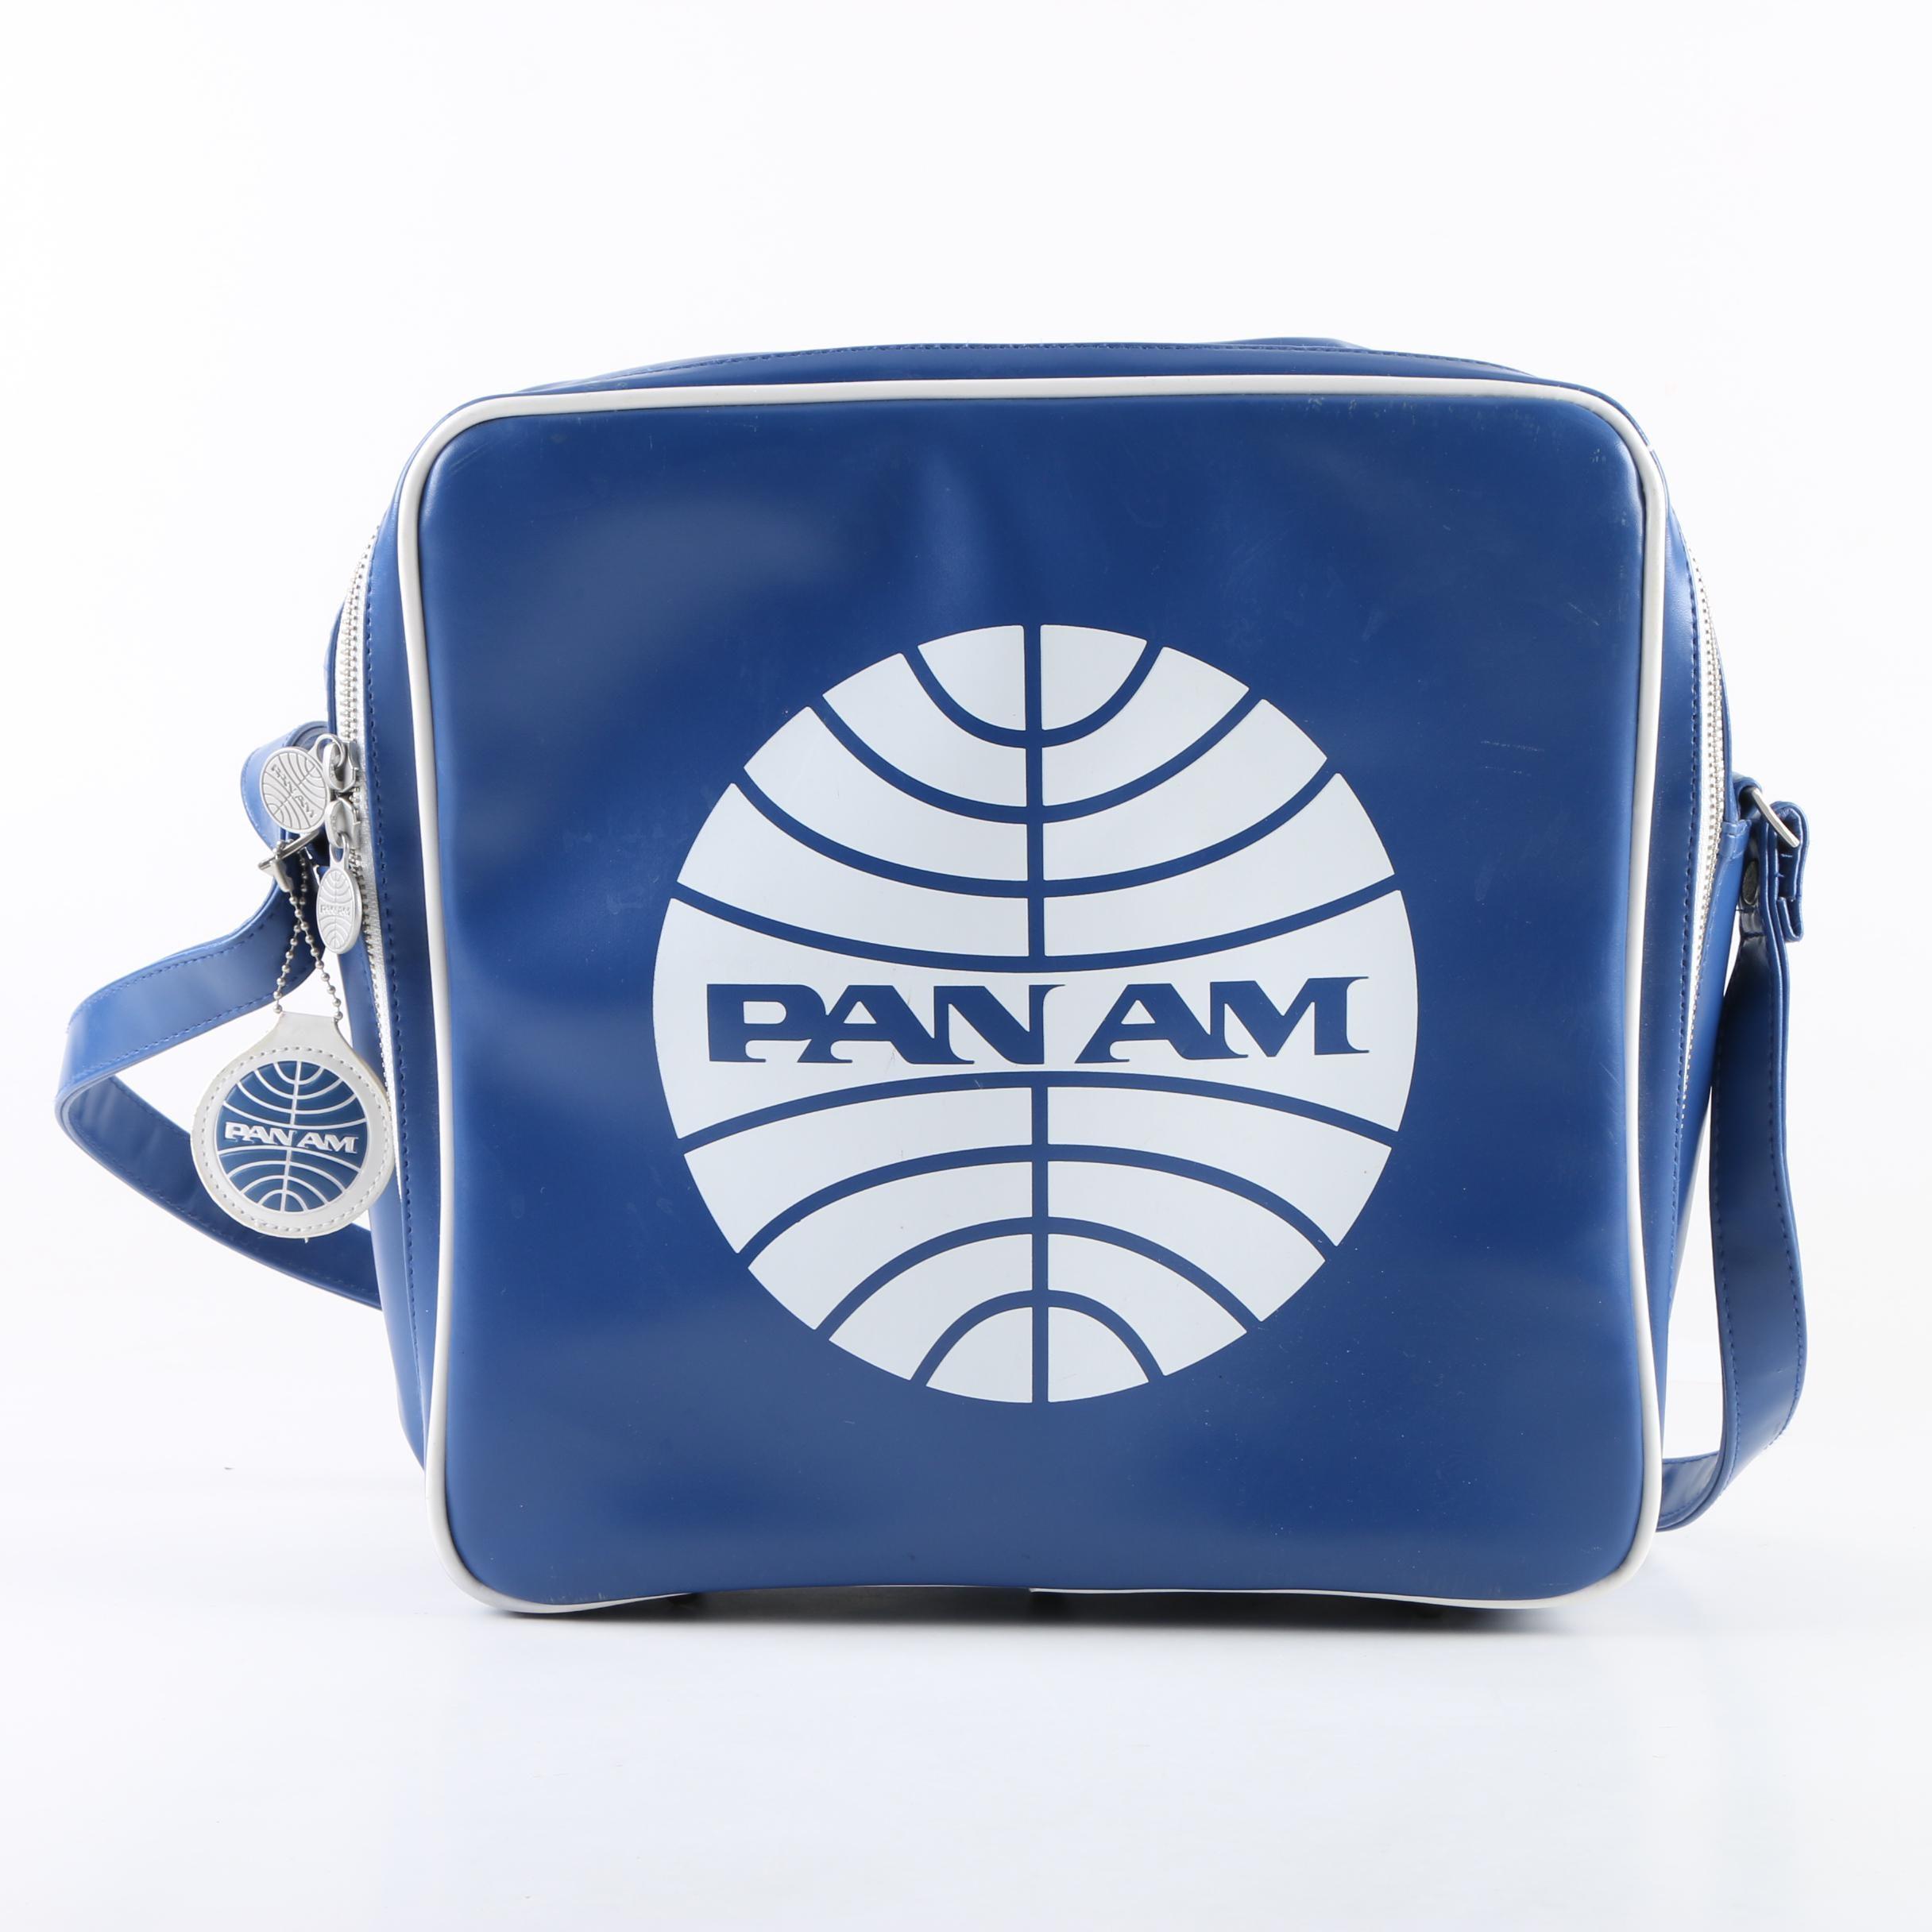 Limited Edition Marc Jacobs Pan Am Carryall Handbag